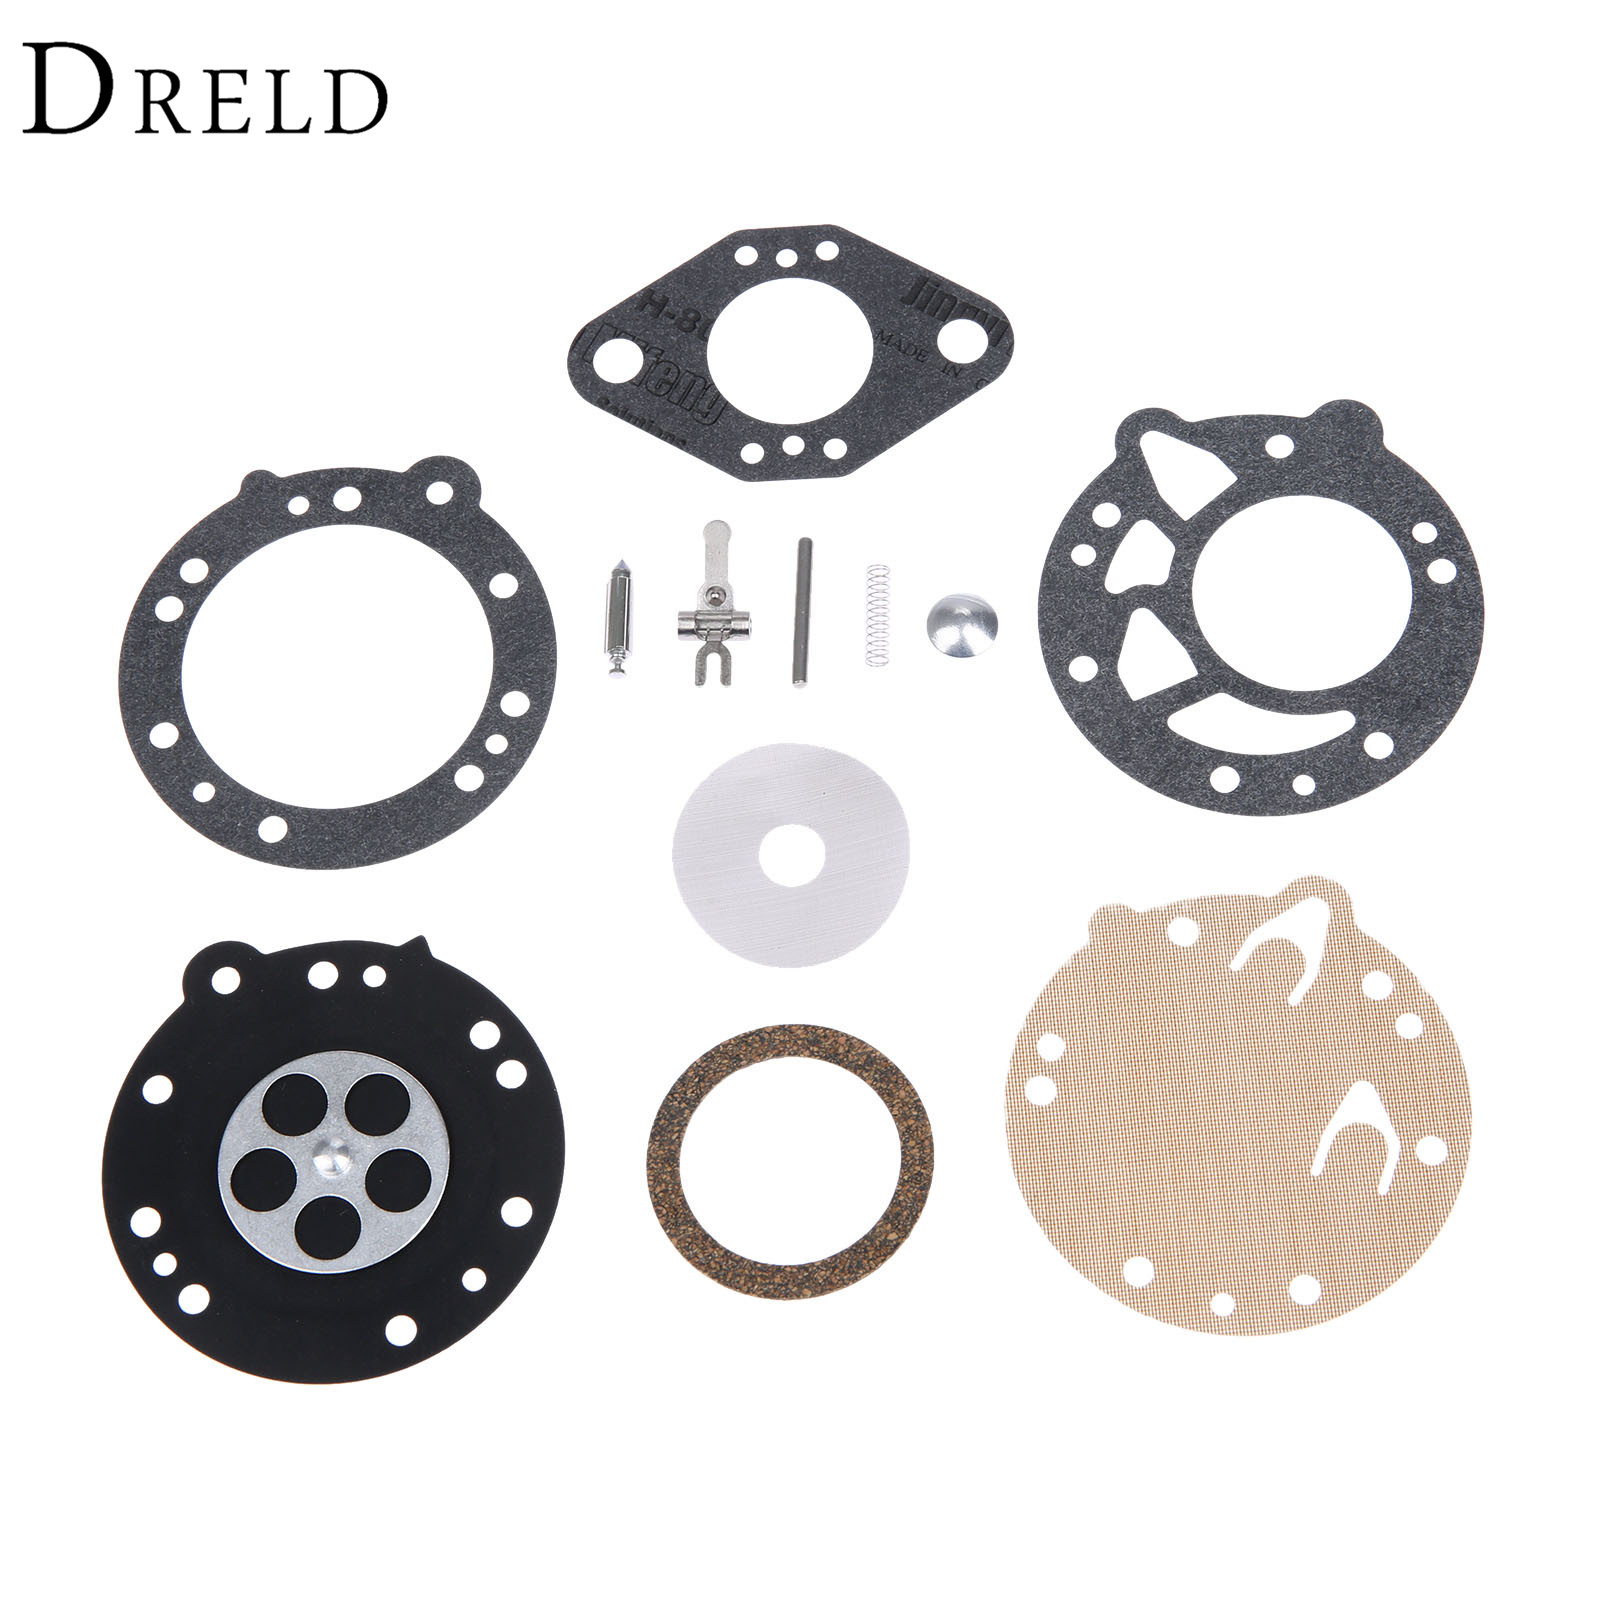 DRELD Carburetor Carb Rebuild Diaphragm Kit For STIHL 08 08S 070 090 Chainsaw TS350 TS360 TILLOTSON RK-83HL Replace Zama RB-42